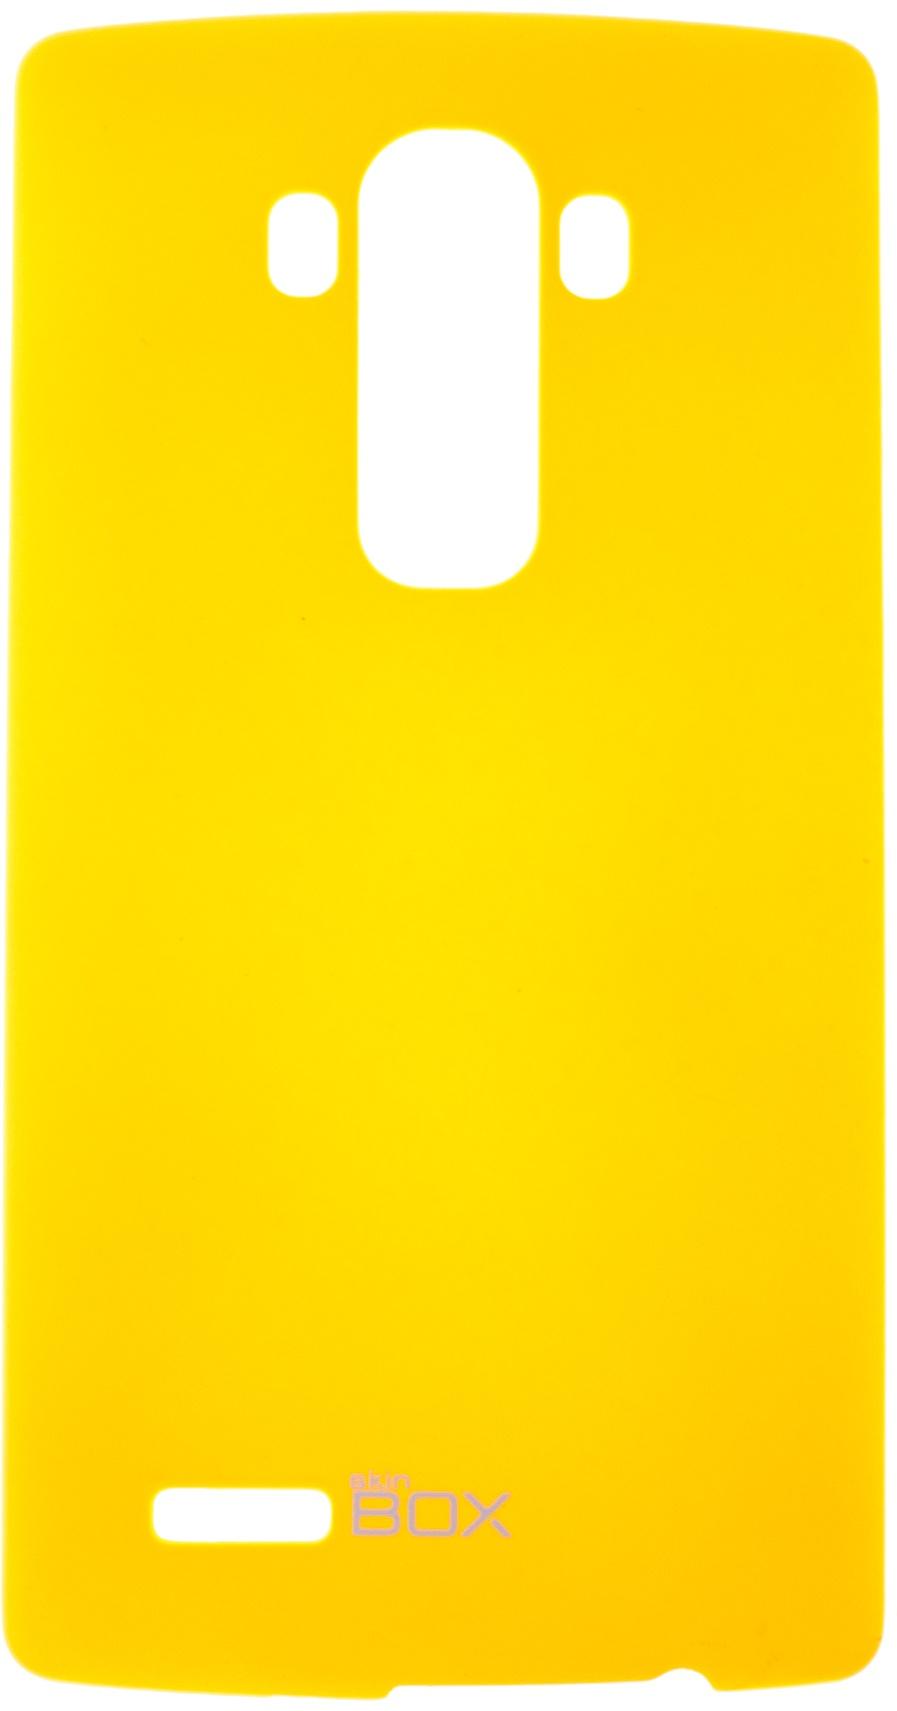 Накладка skinBOX для LG G4, 2000000076409, желтый аккумулятор для телефона ibatt bl 53yh для lg d855 g3 d690 d690 g3 stylus d851 g3 d850 g3 d856 lg g3 dual lte vs985 g3 ls990 g3 d690n f400 g3 aka